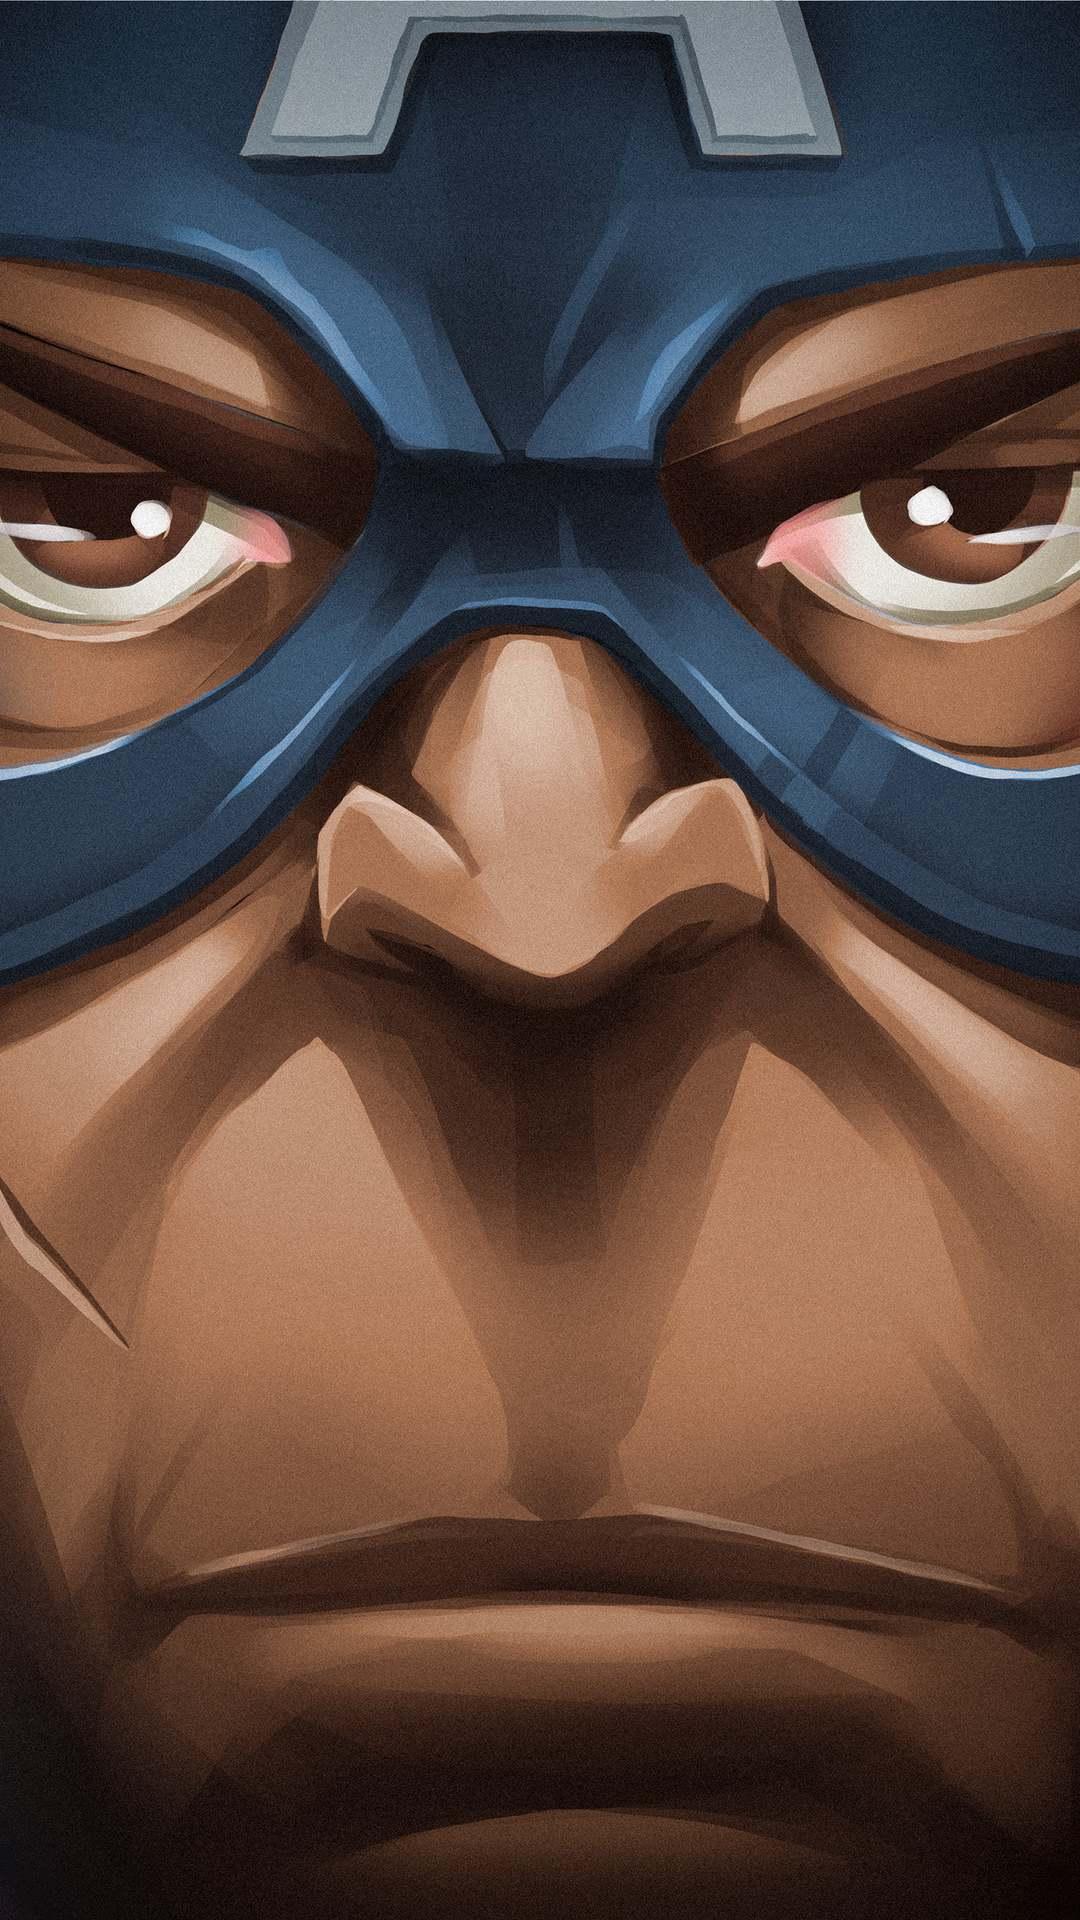 Captain America Face iPhone Wallpaper